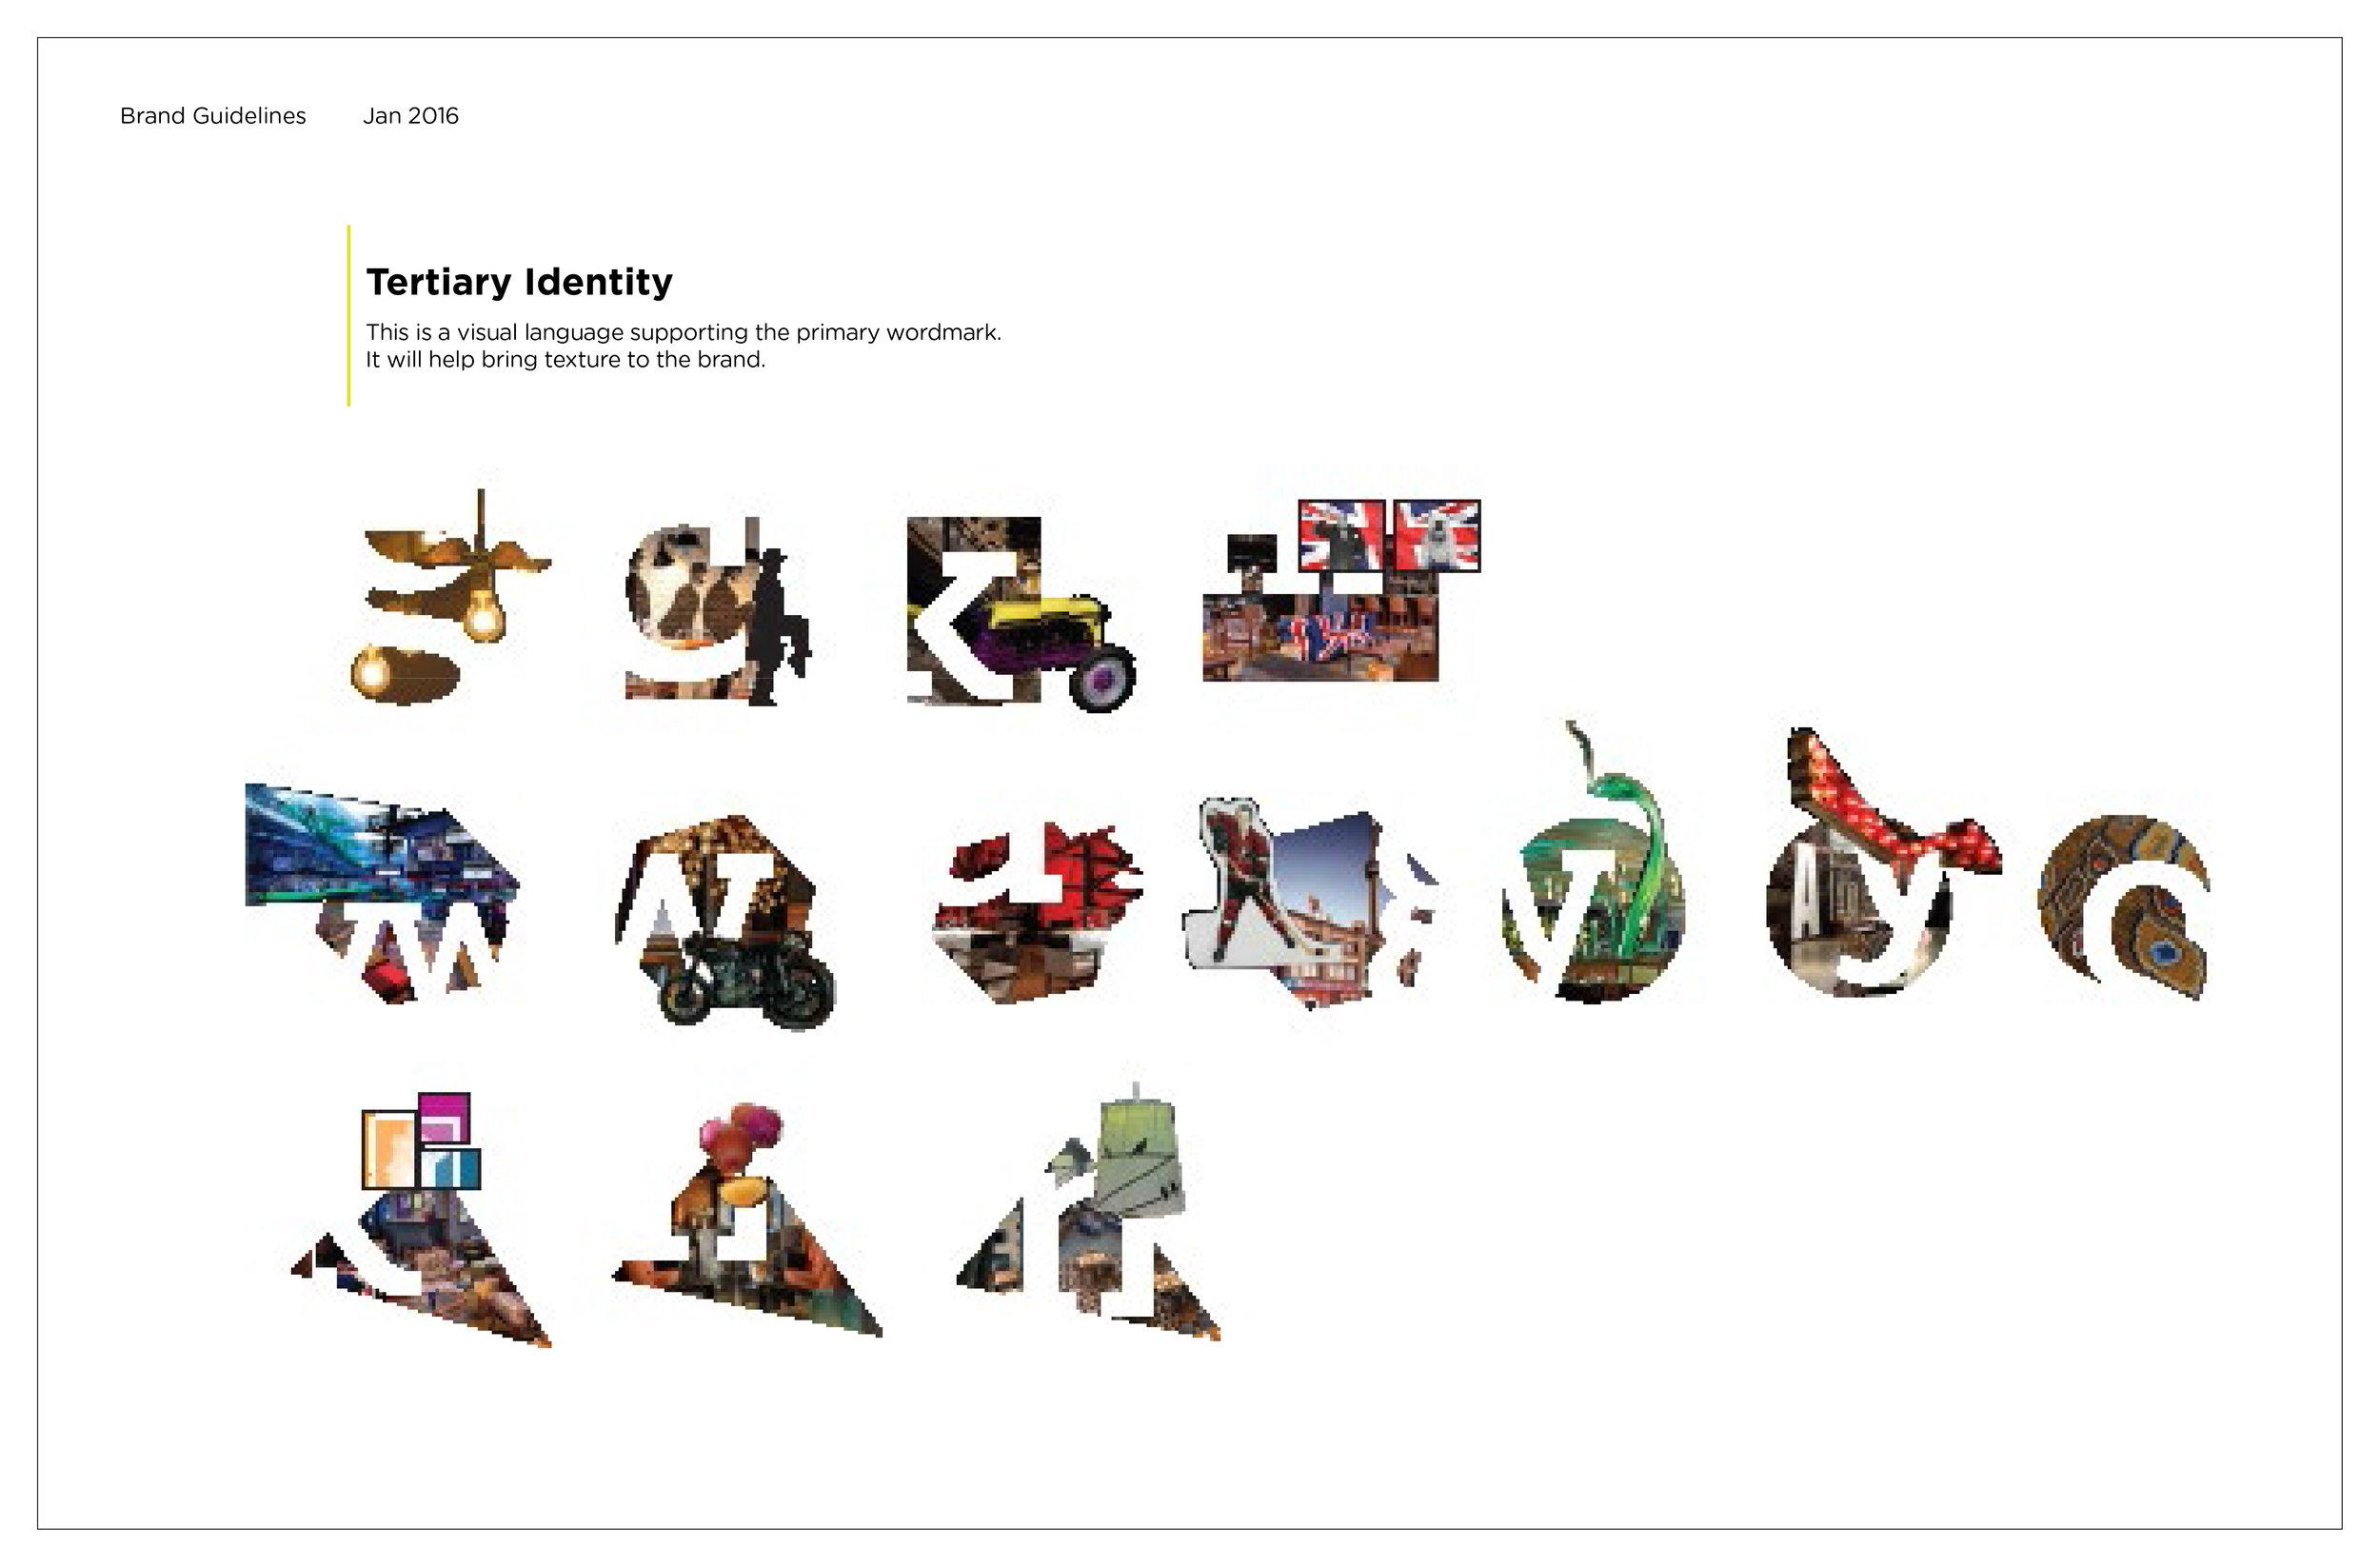 MW new brandstandards_secondarylogo-04.jpg